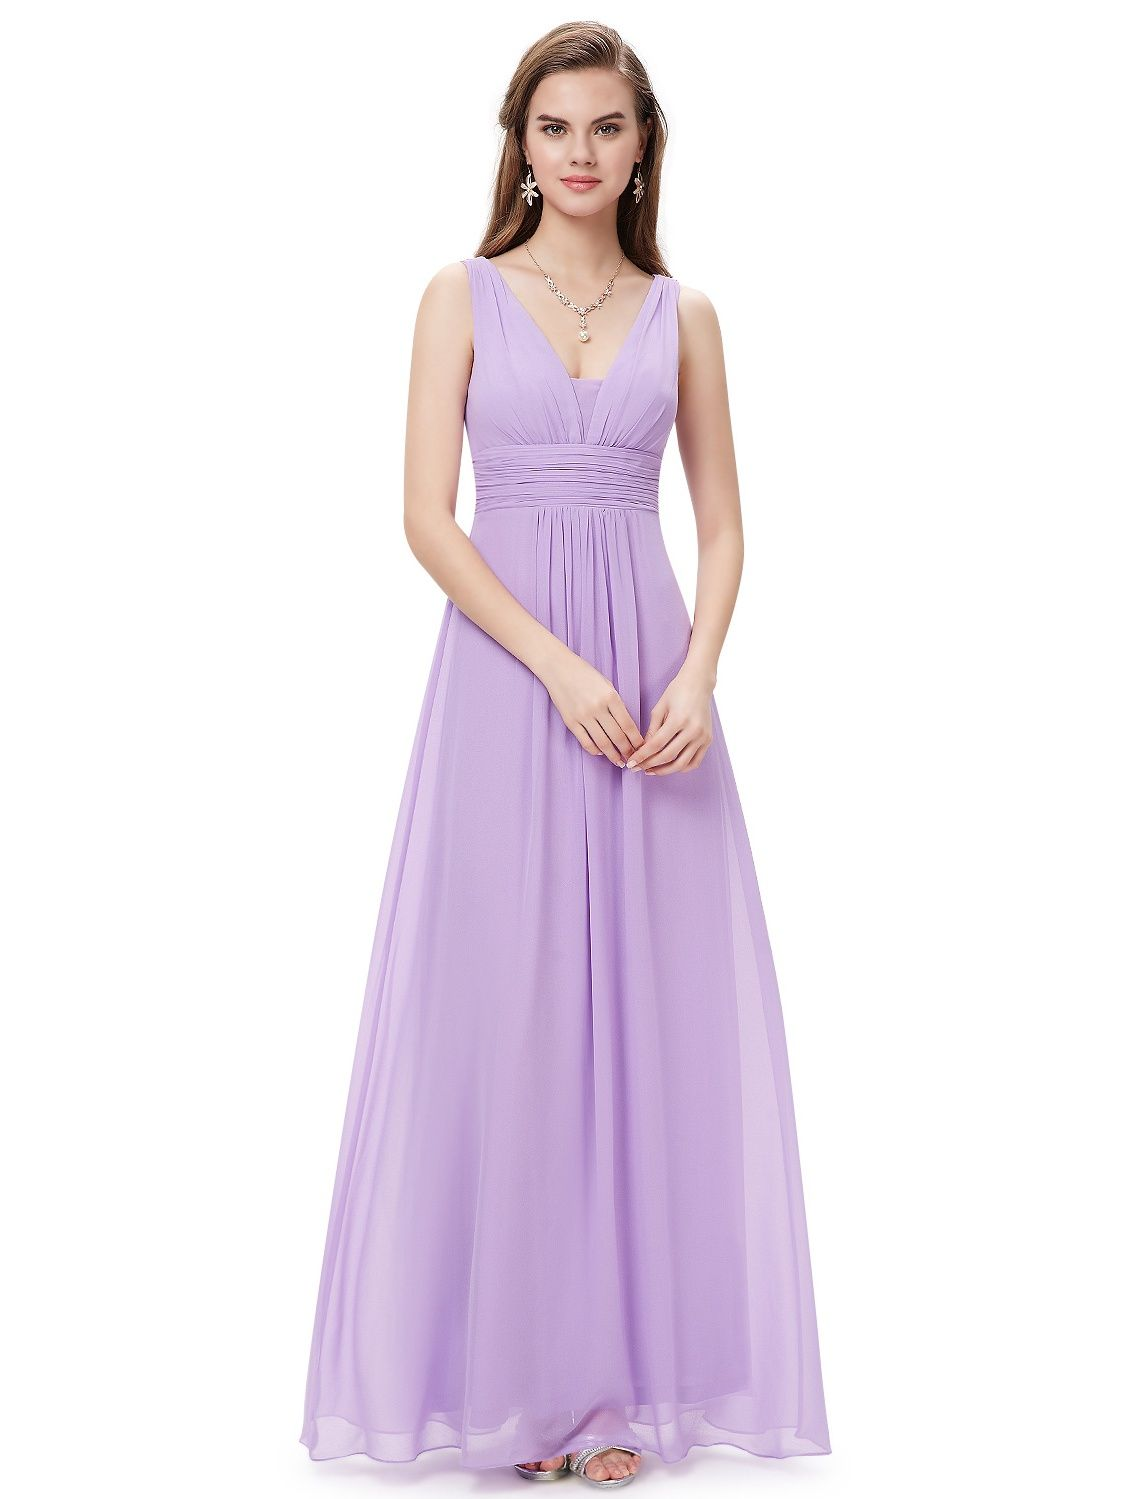 2affc5ac72 Ever-Pretty Women's Elegant Long Maxi V Neck Chiffon Evening Cocktail Prom  Party Bridesmaid Wedding